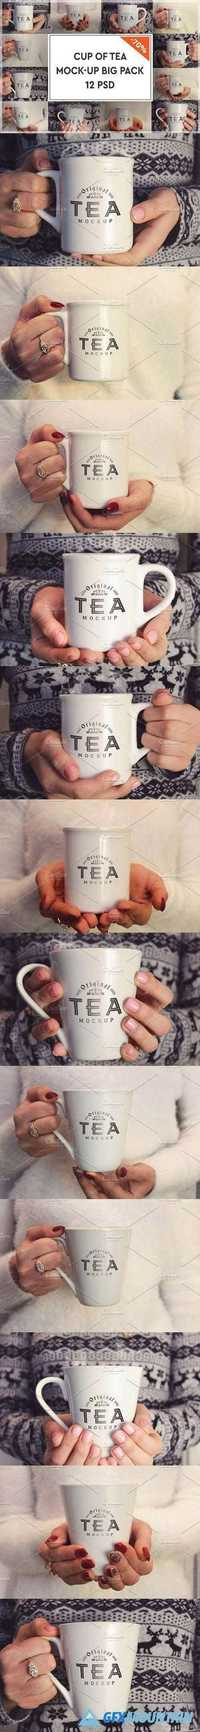 Cup of Tea Mock-up Bigpack 1259170